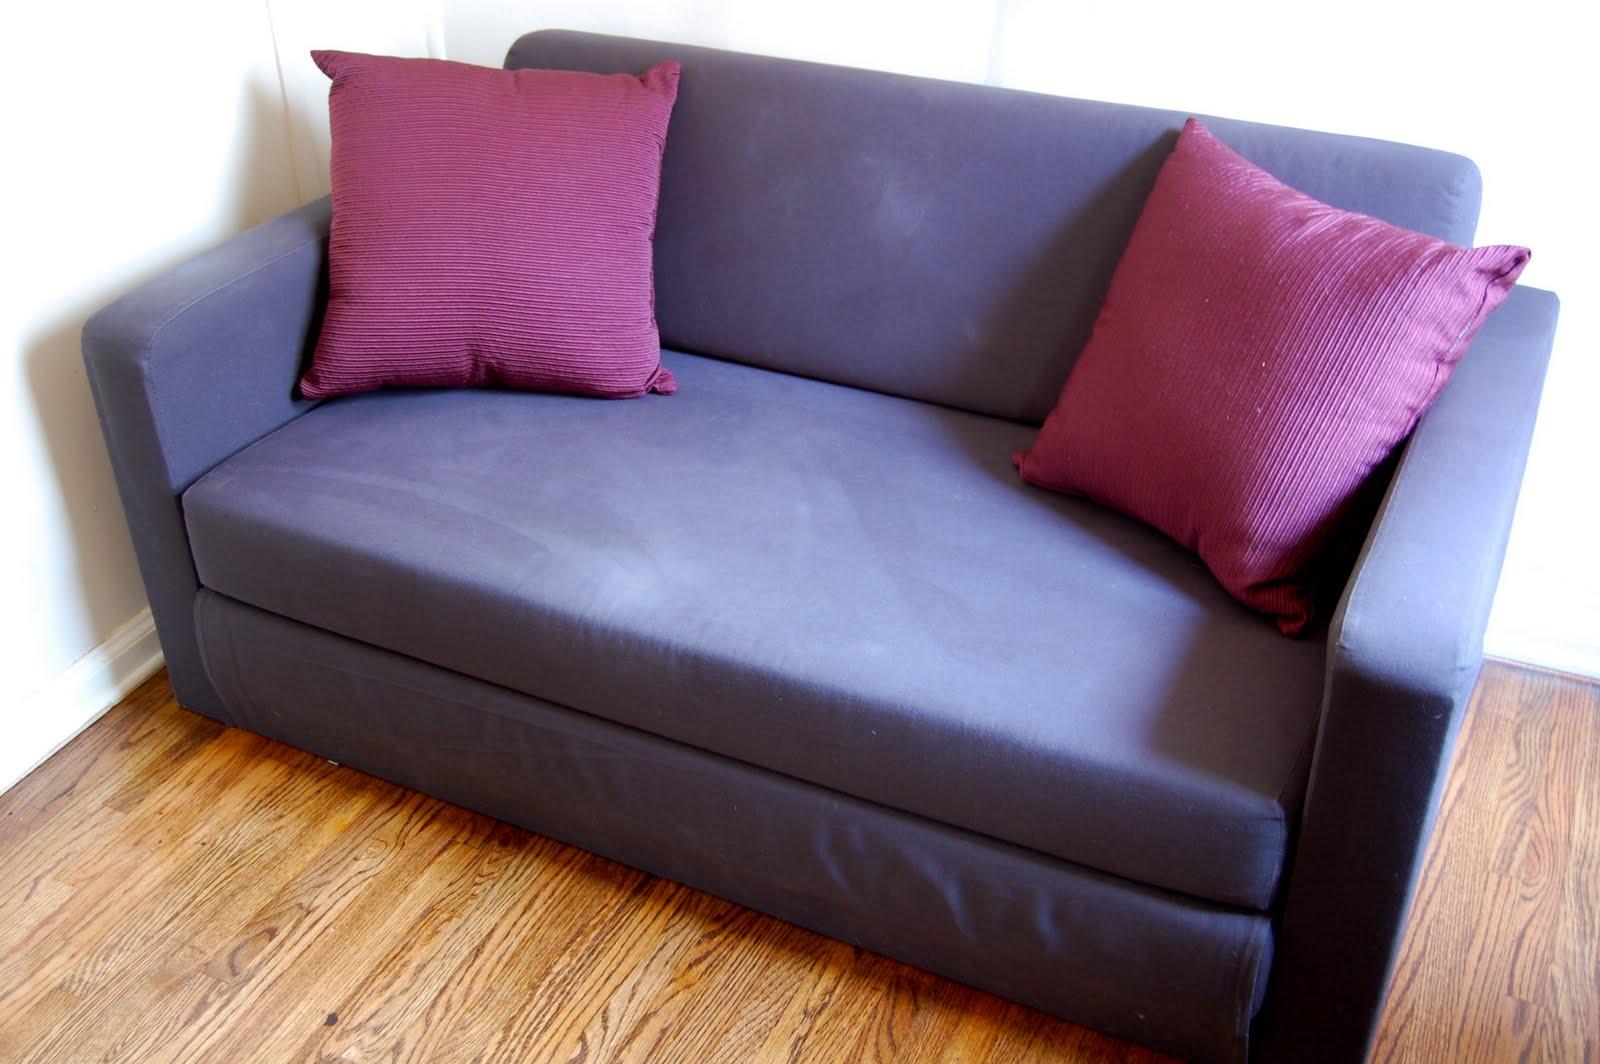 solsta sofa bed ransta dark gray 149 00 couch sale toronto reno doozins creating an office part ii